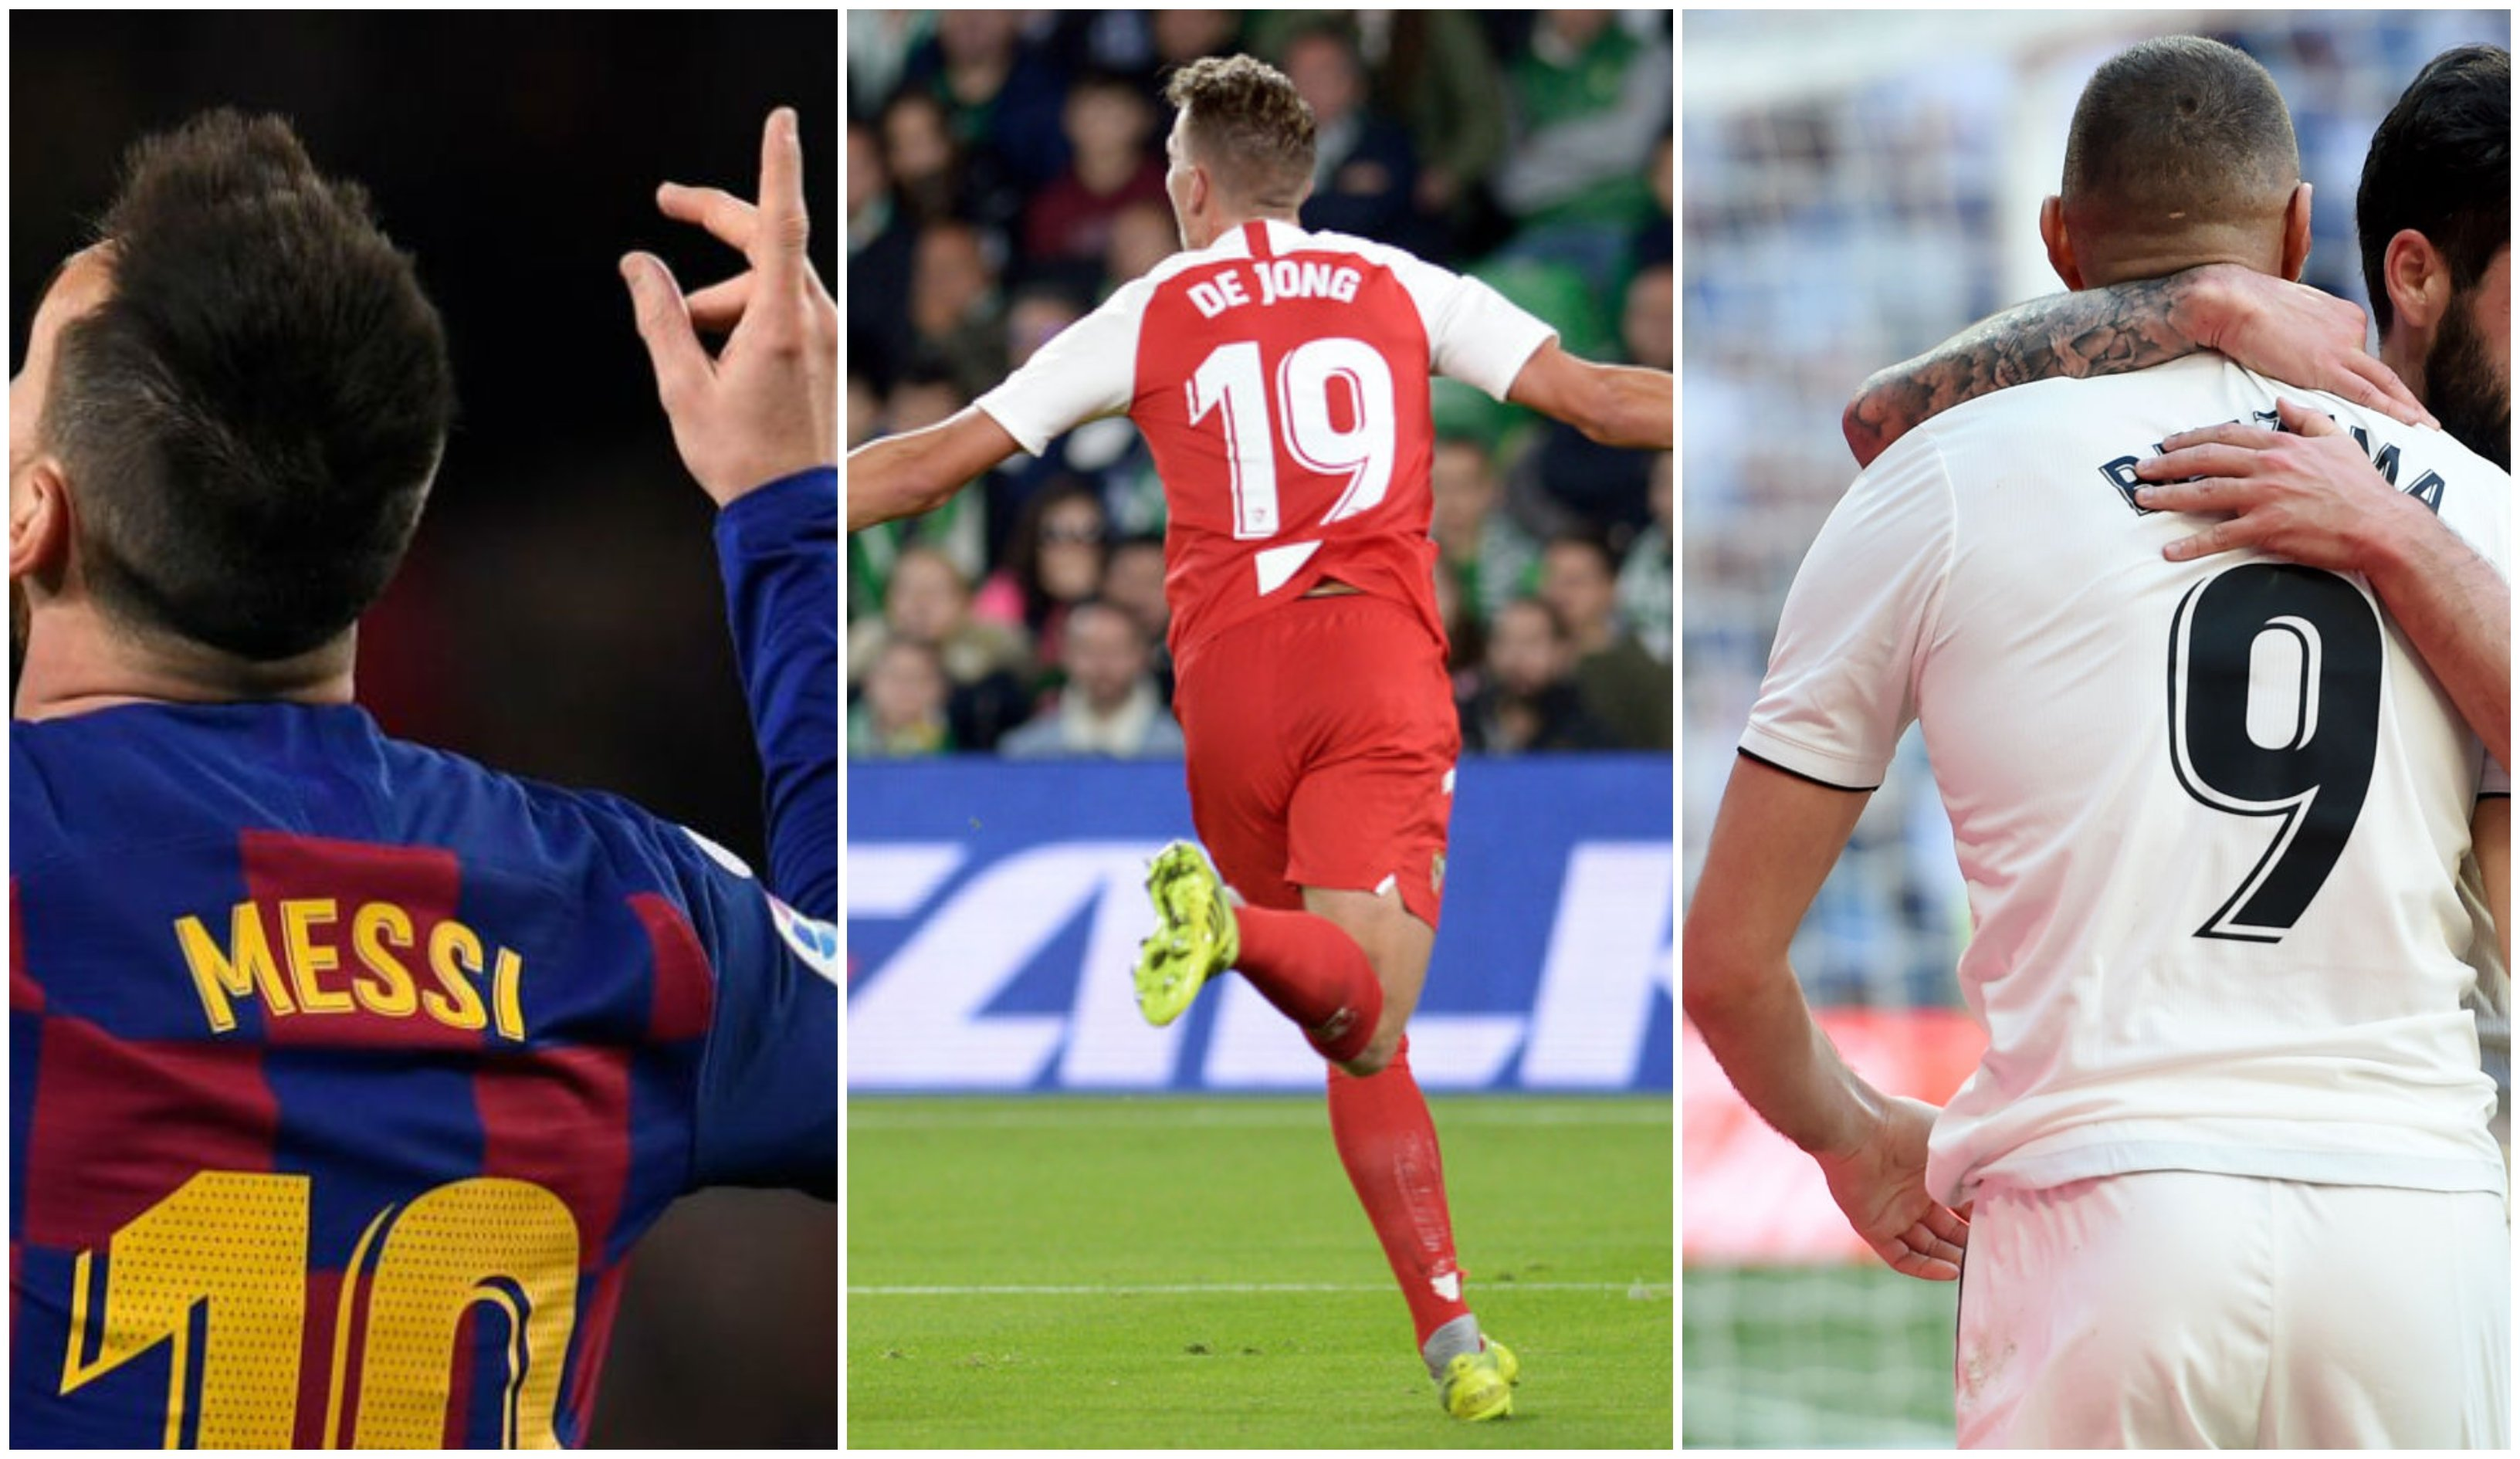 La Liga 2019 Matchweek 12 Round-Up and Highlights